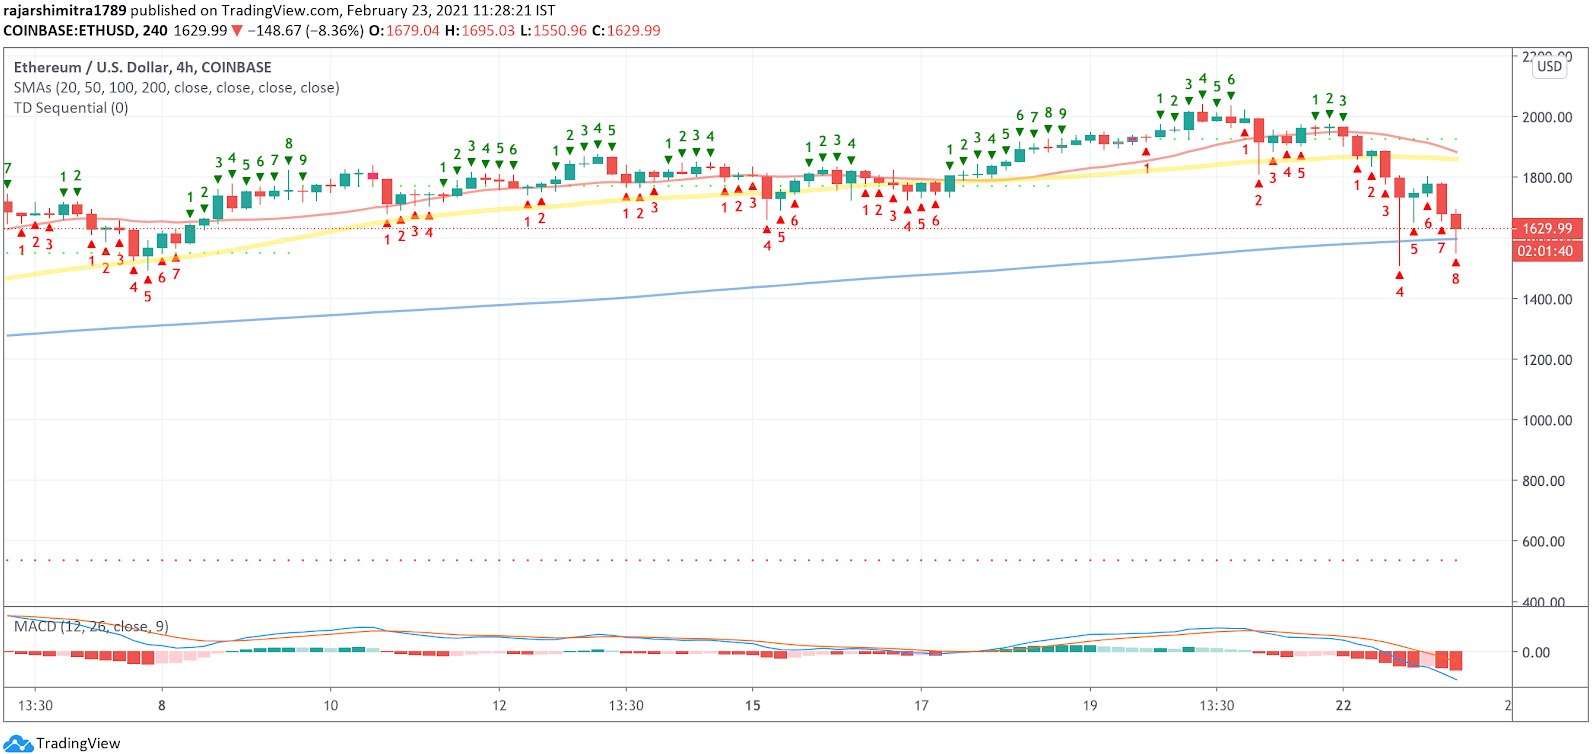 eth/usd 4-hour chart 022321